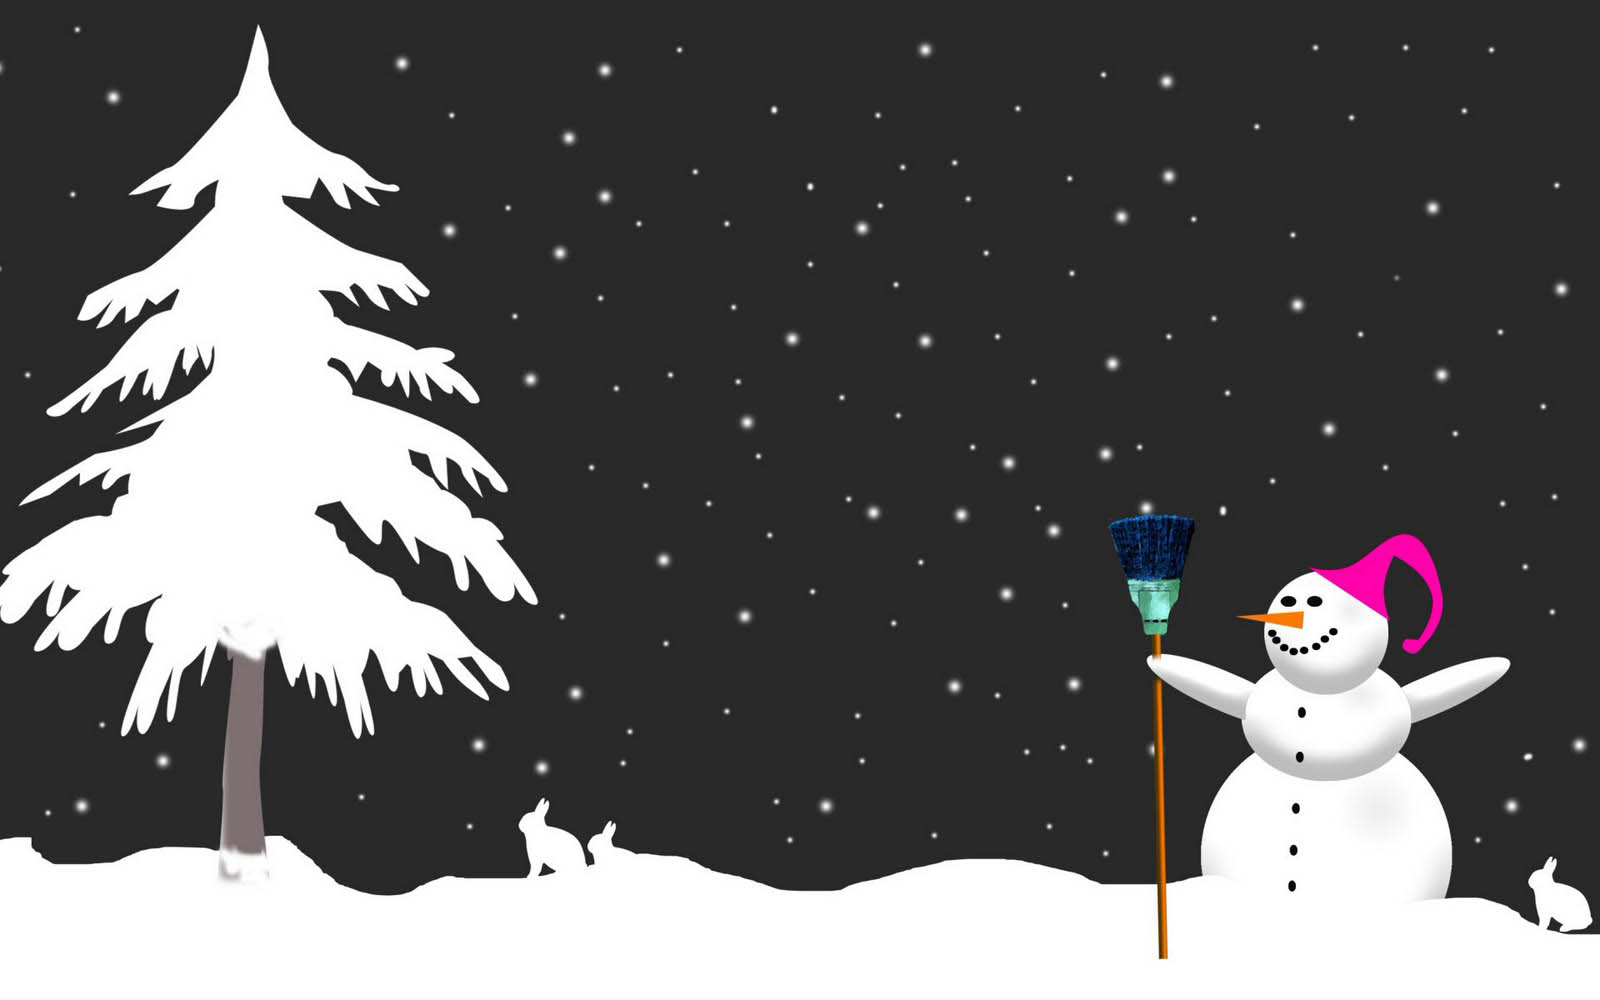 snowman desktop background - photo #16